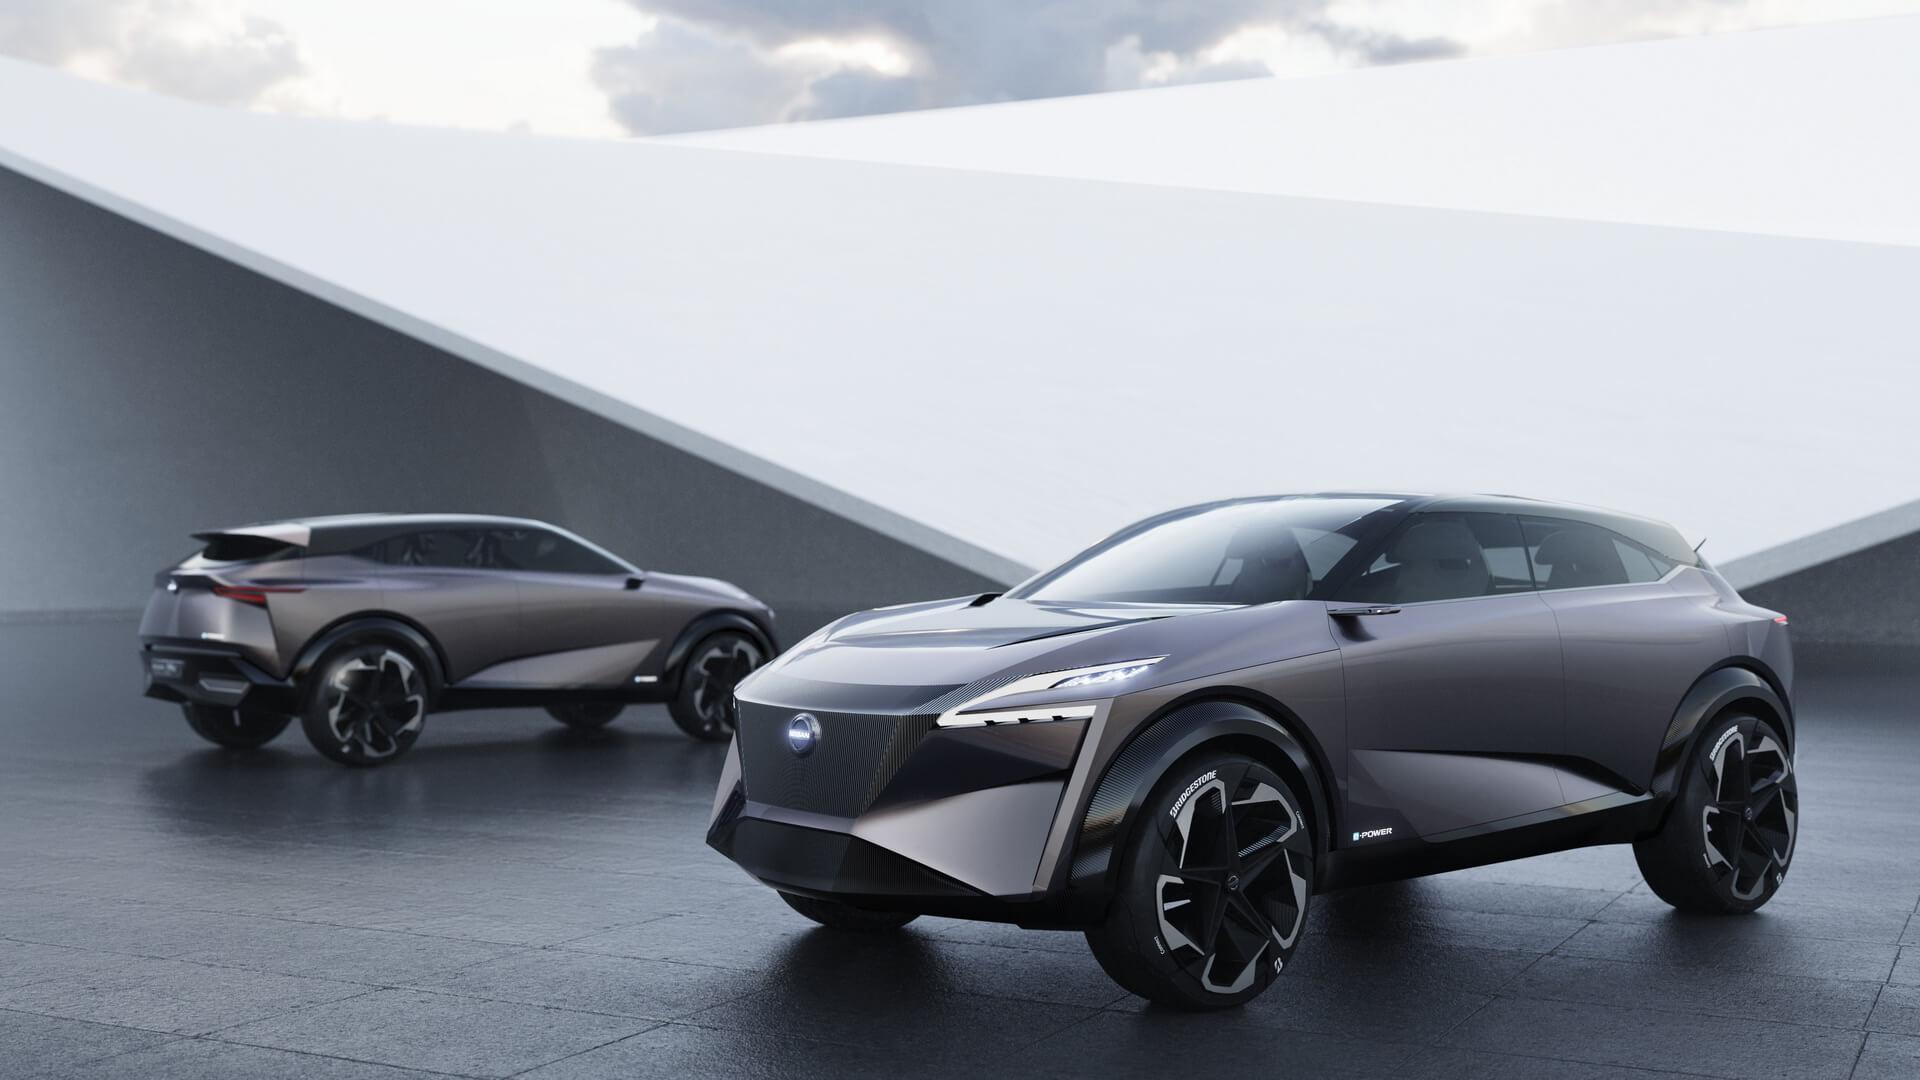 Nissan IMQ: гибридный кроссовер с технологией e-POWER мощностью 250 кВт